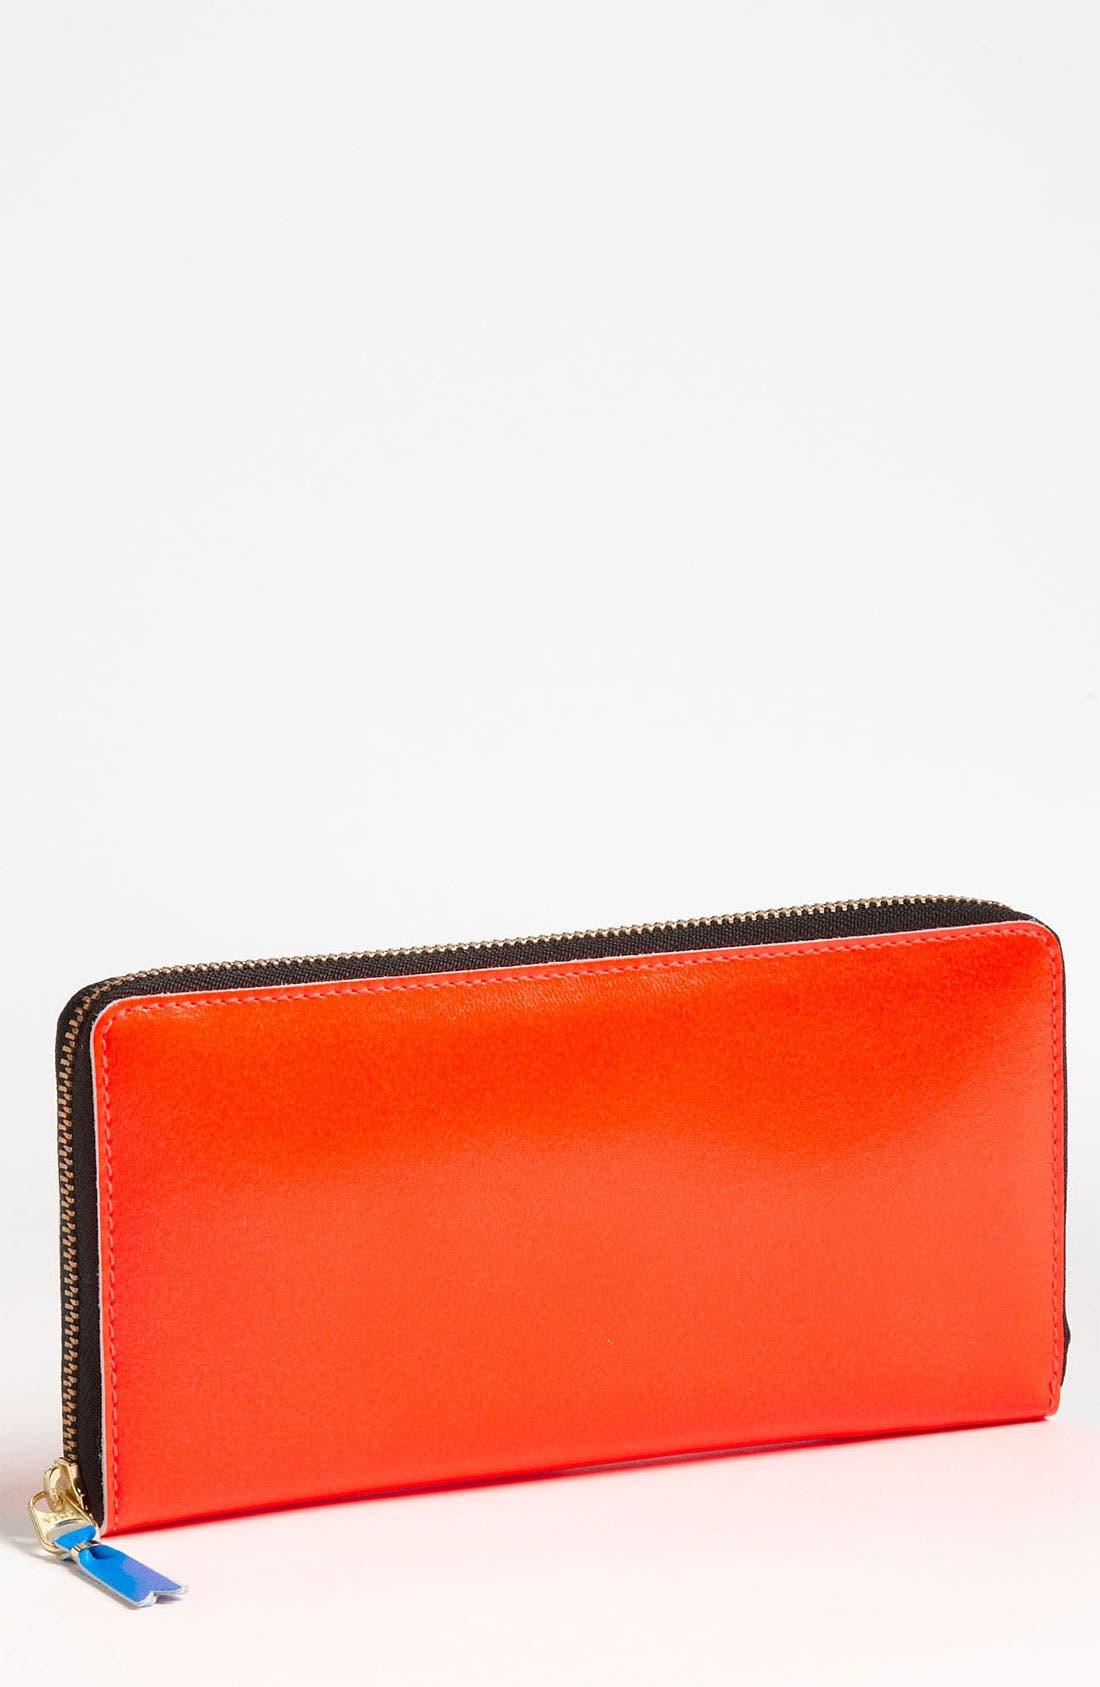 Alternate Image 1 Selected - Comme des Garçons 'Super Fluo' Continental Wallet